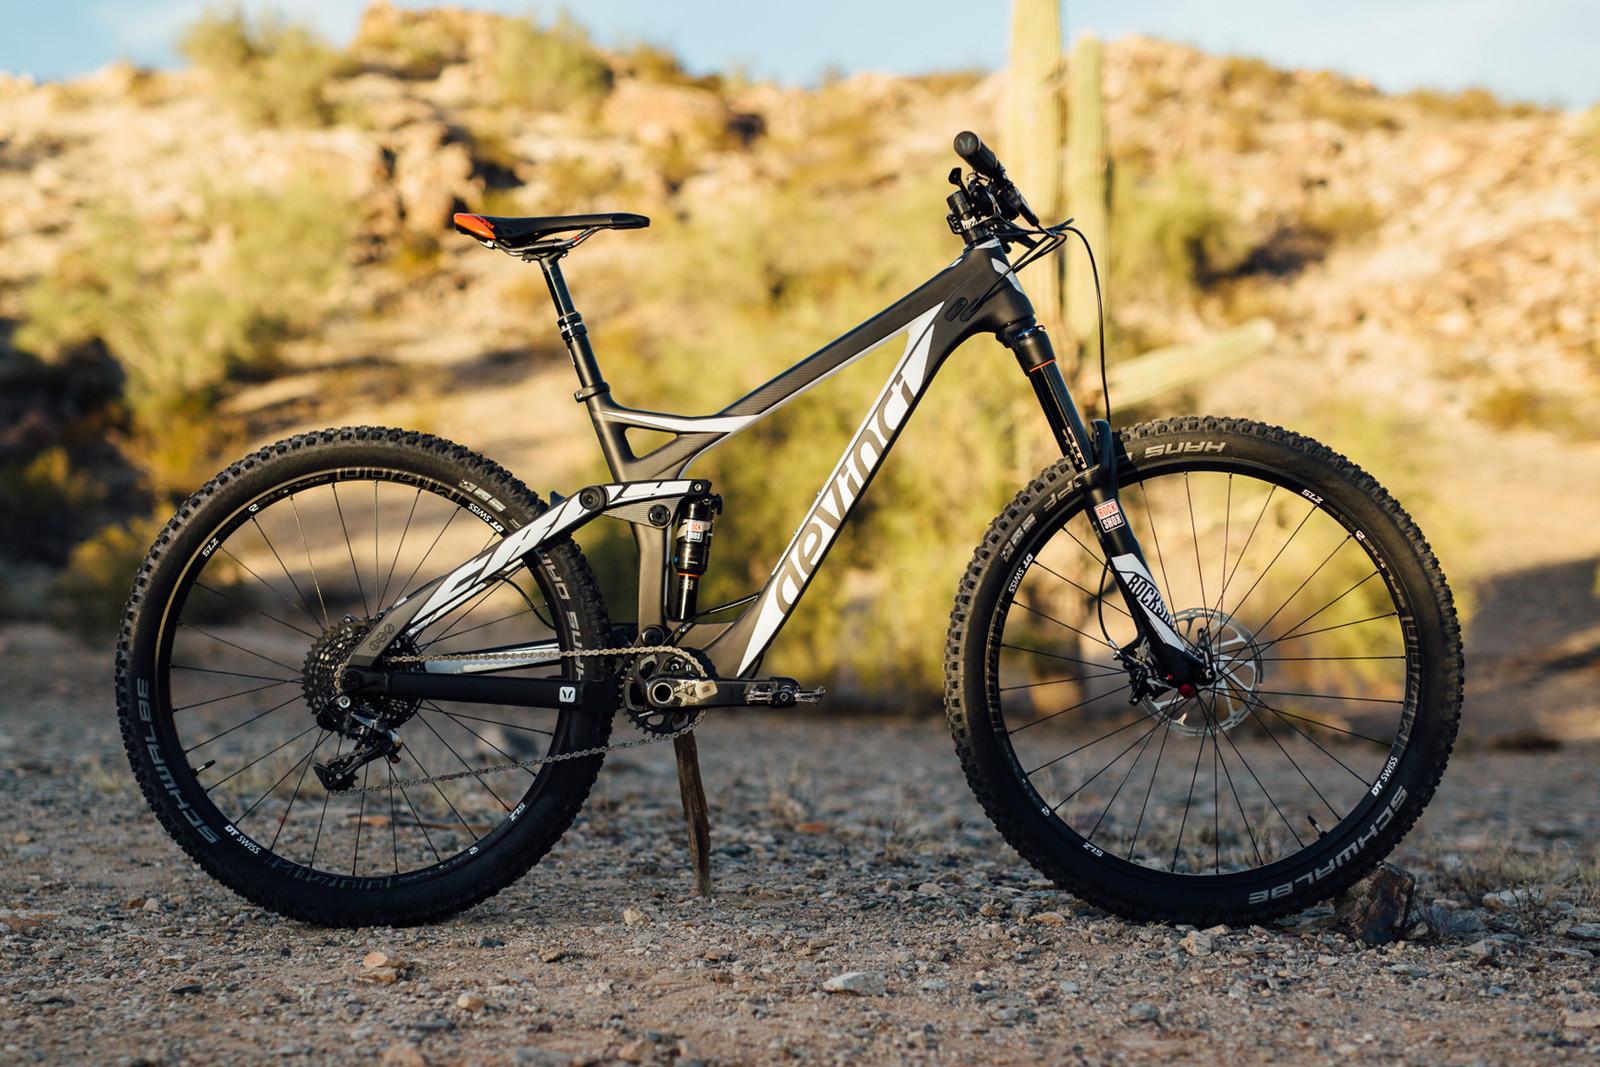 2016 Devinci Troy Carbon RR - 17 Bikes Tested - 2016 Vital MTB Test Sessions - Mountain Biking Pictures - Vital MTB